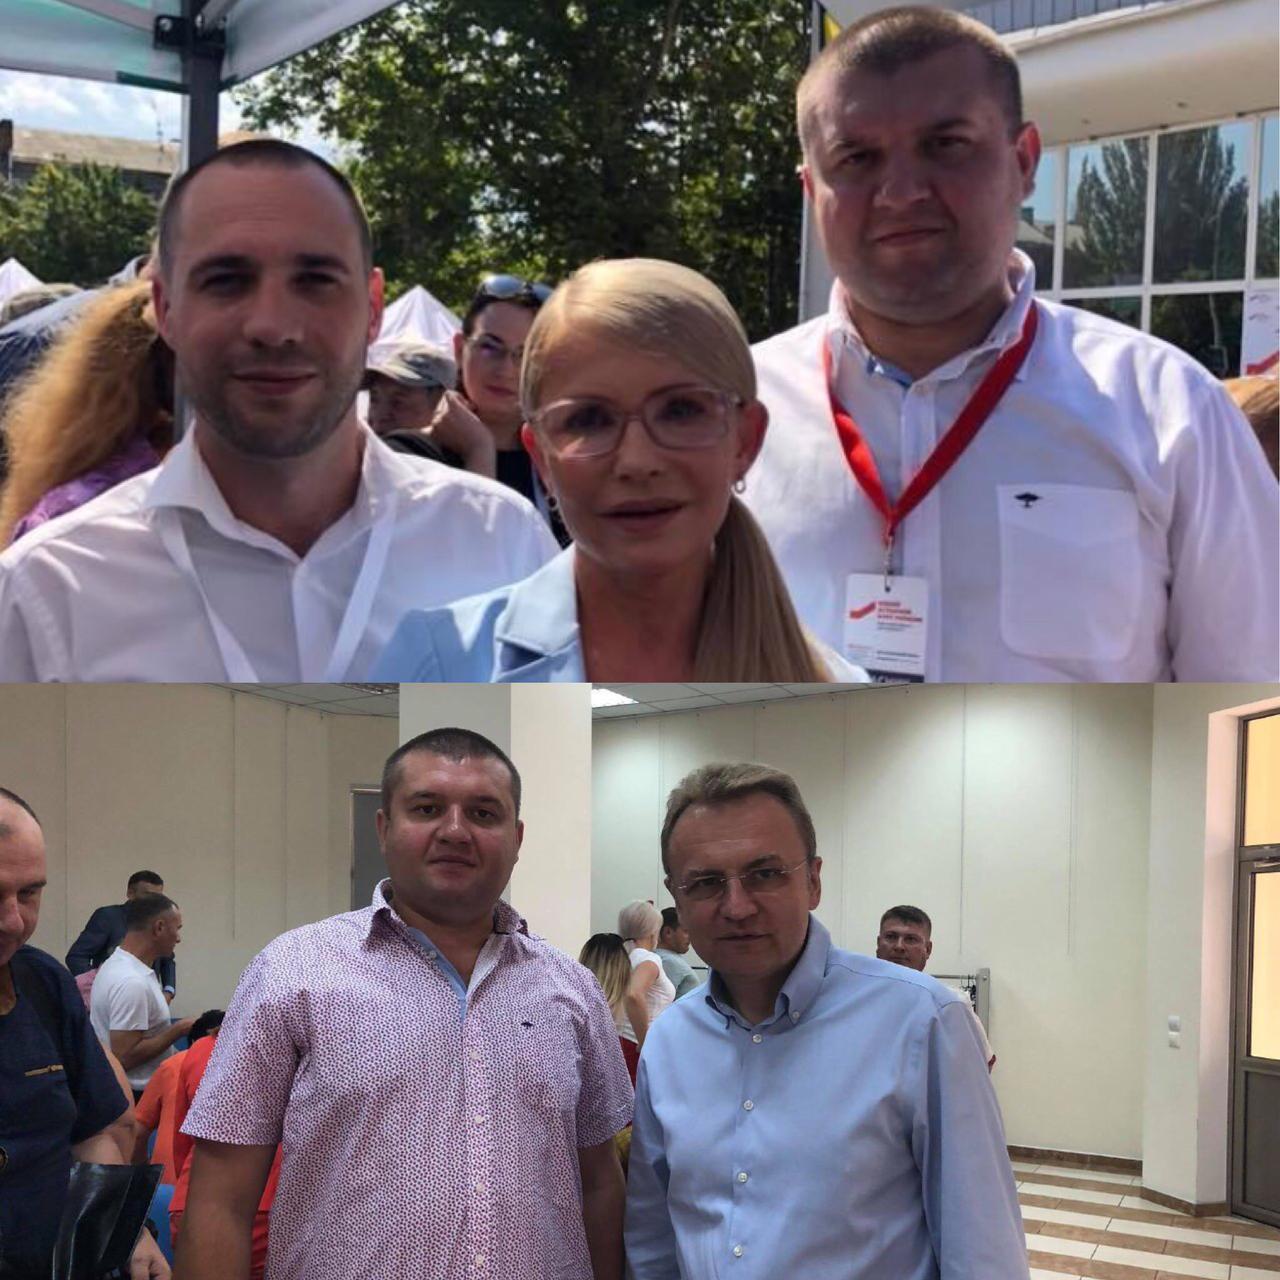 В Николаеве похитили почти 1 миллион на капремонтах лифтов, — прокуратура